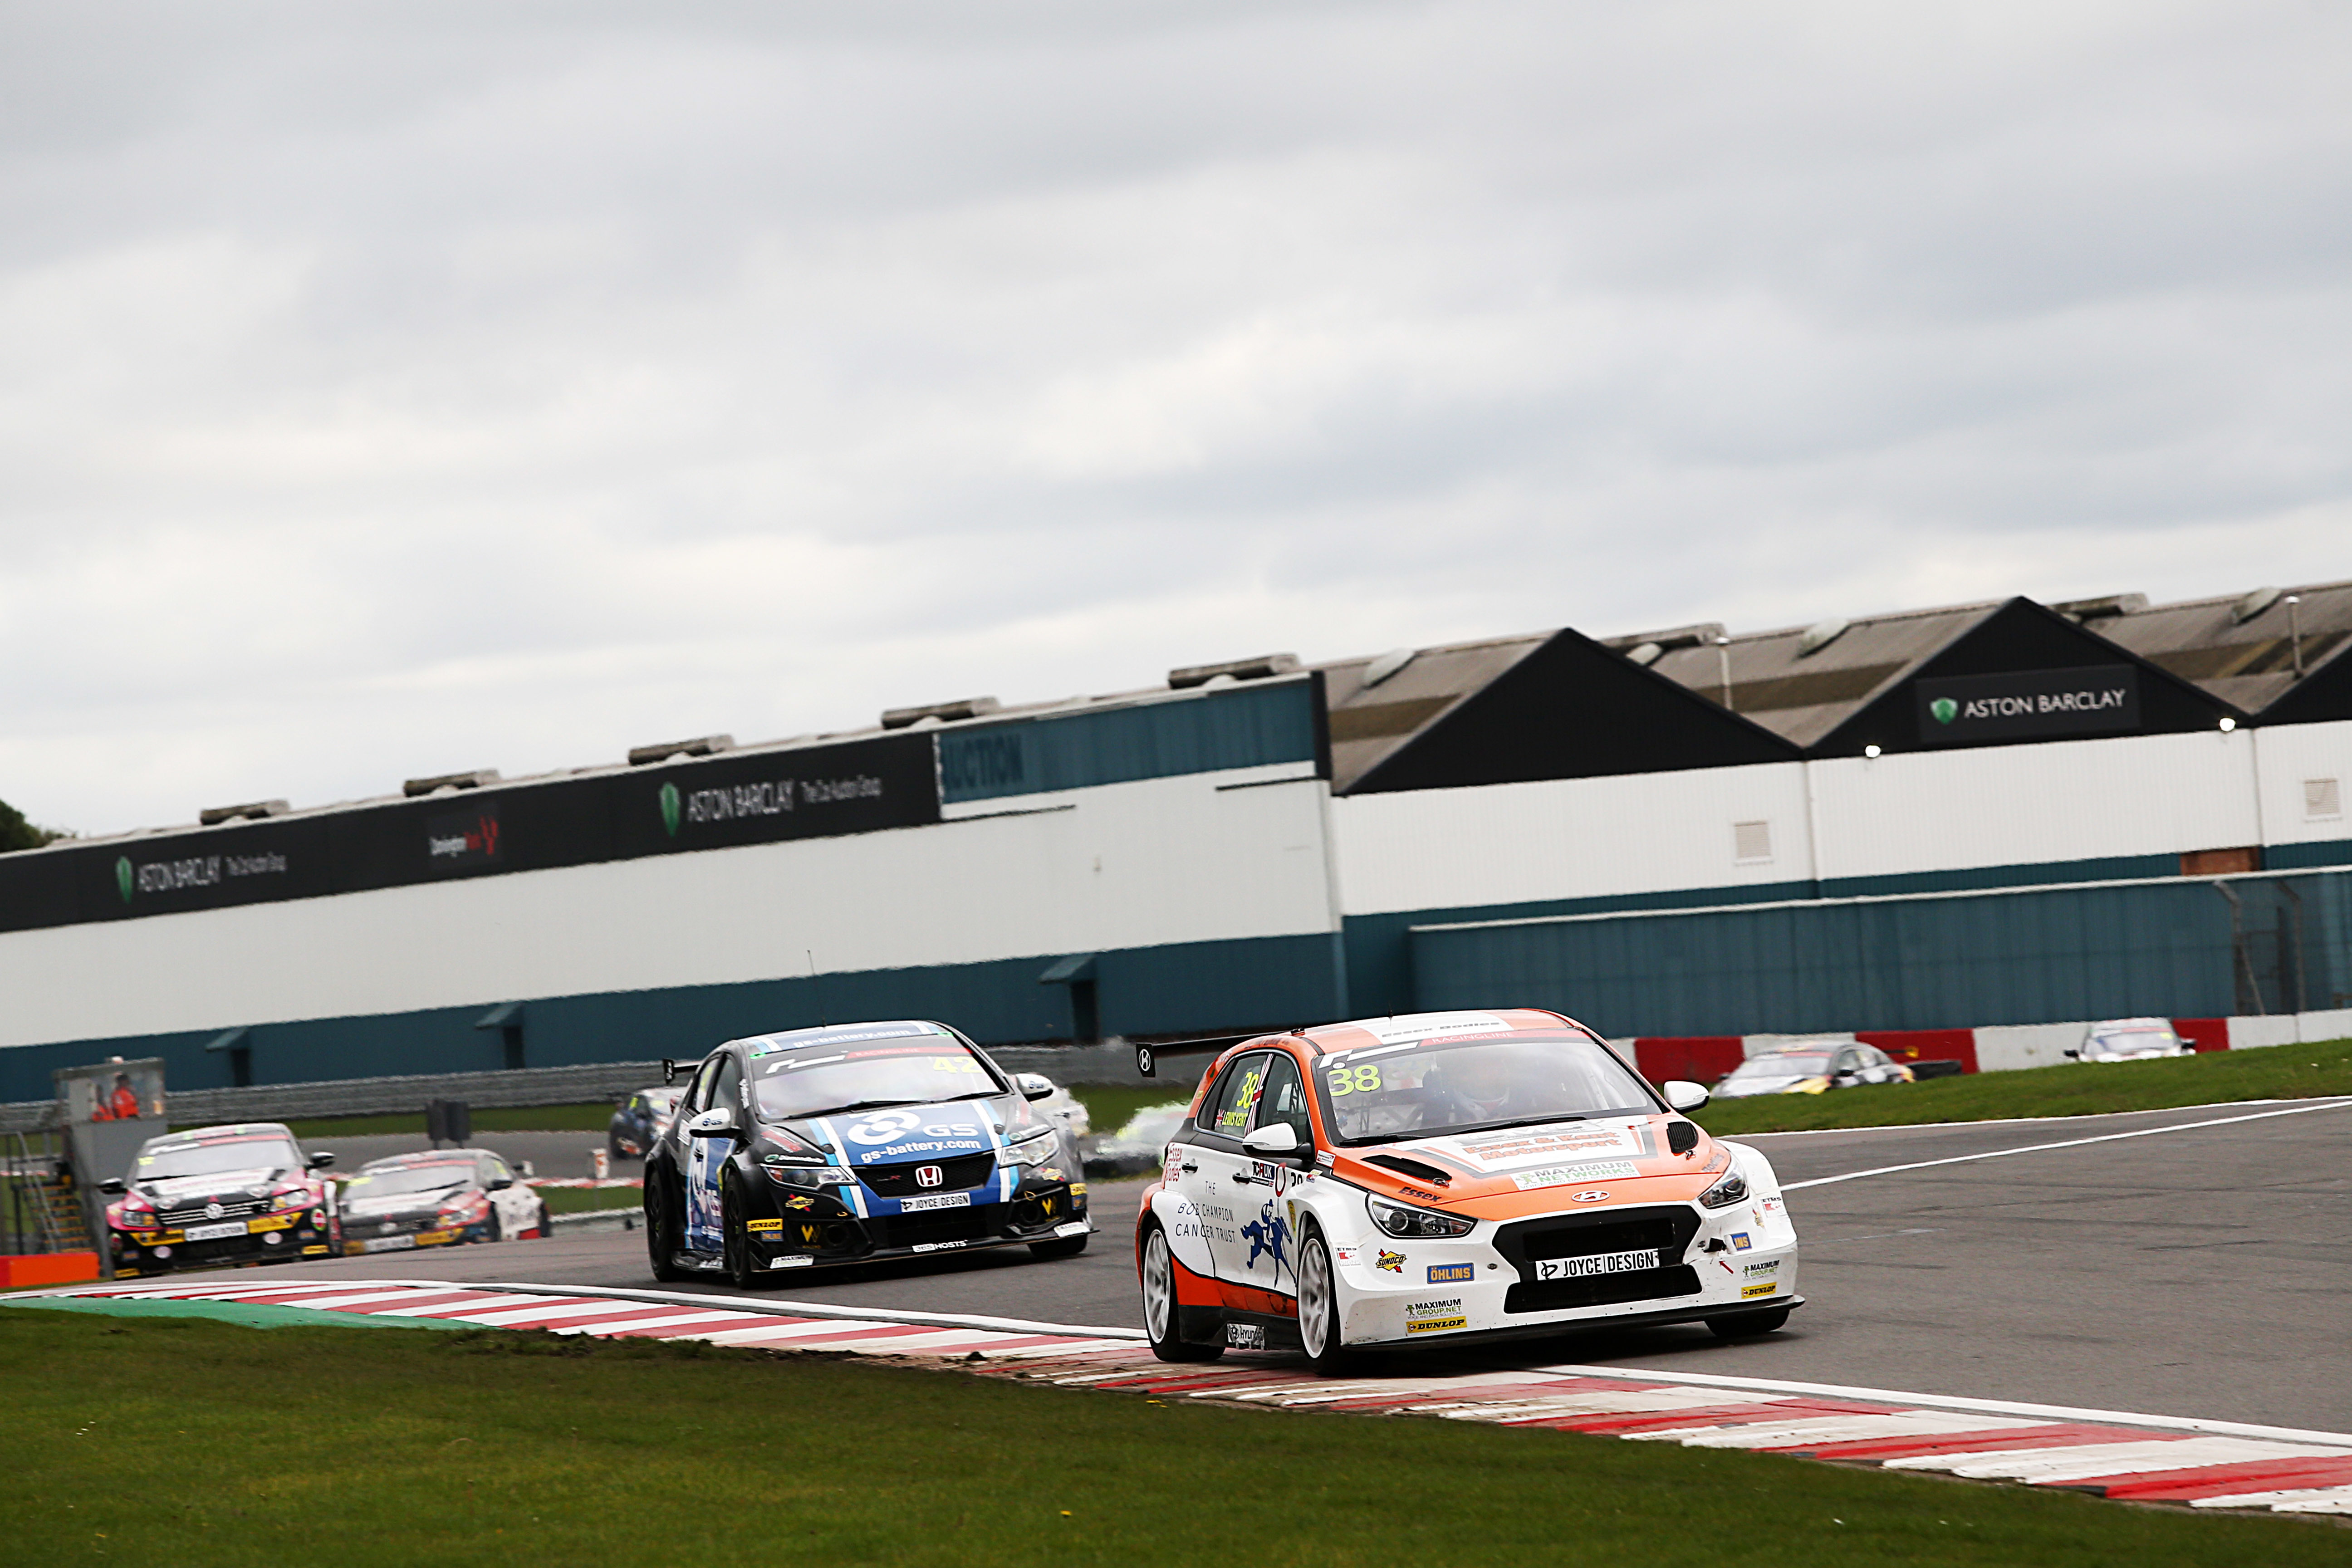 Lewis Kent - Donington Park - i30 N TCR